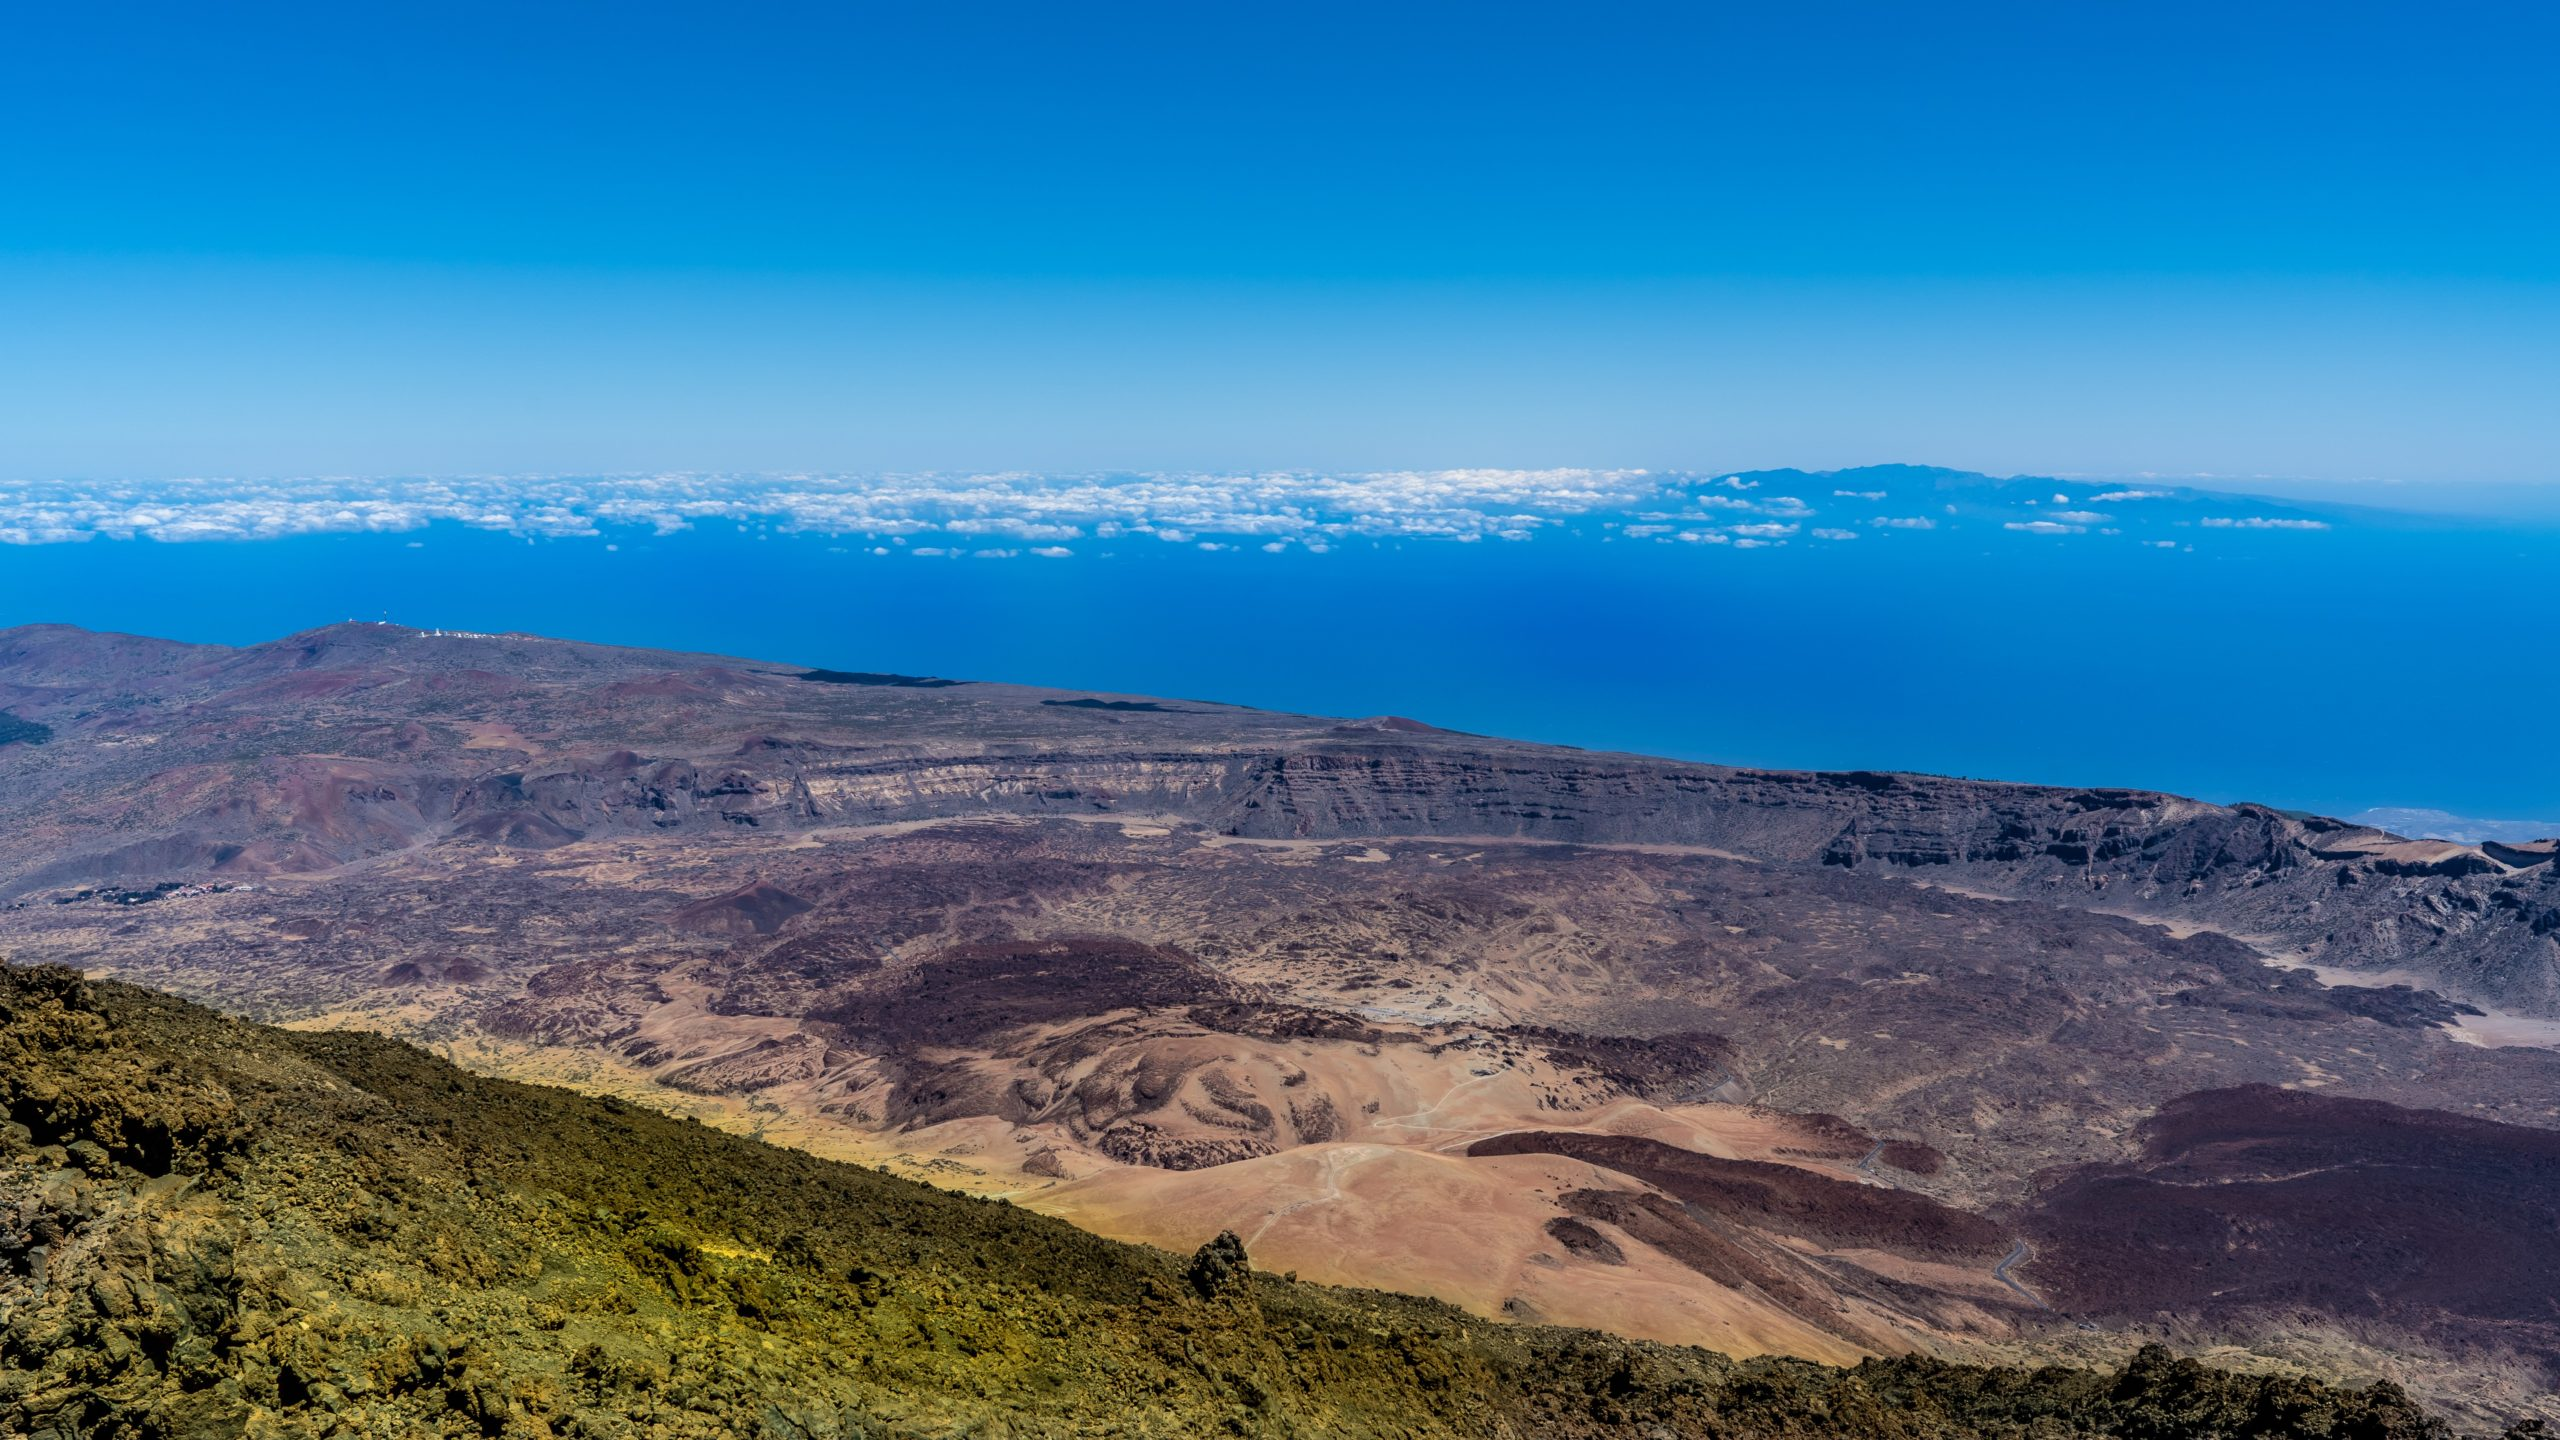 Atlantik, Teneriffa, auf dem Pico del Teide in 3500 Meter Höhe